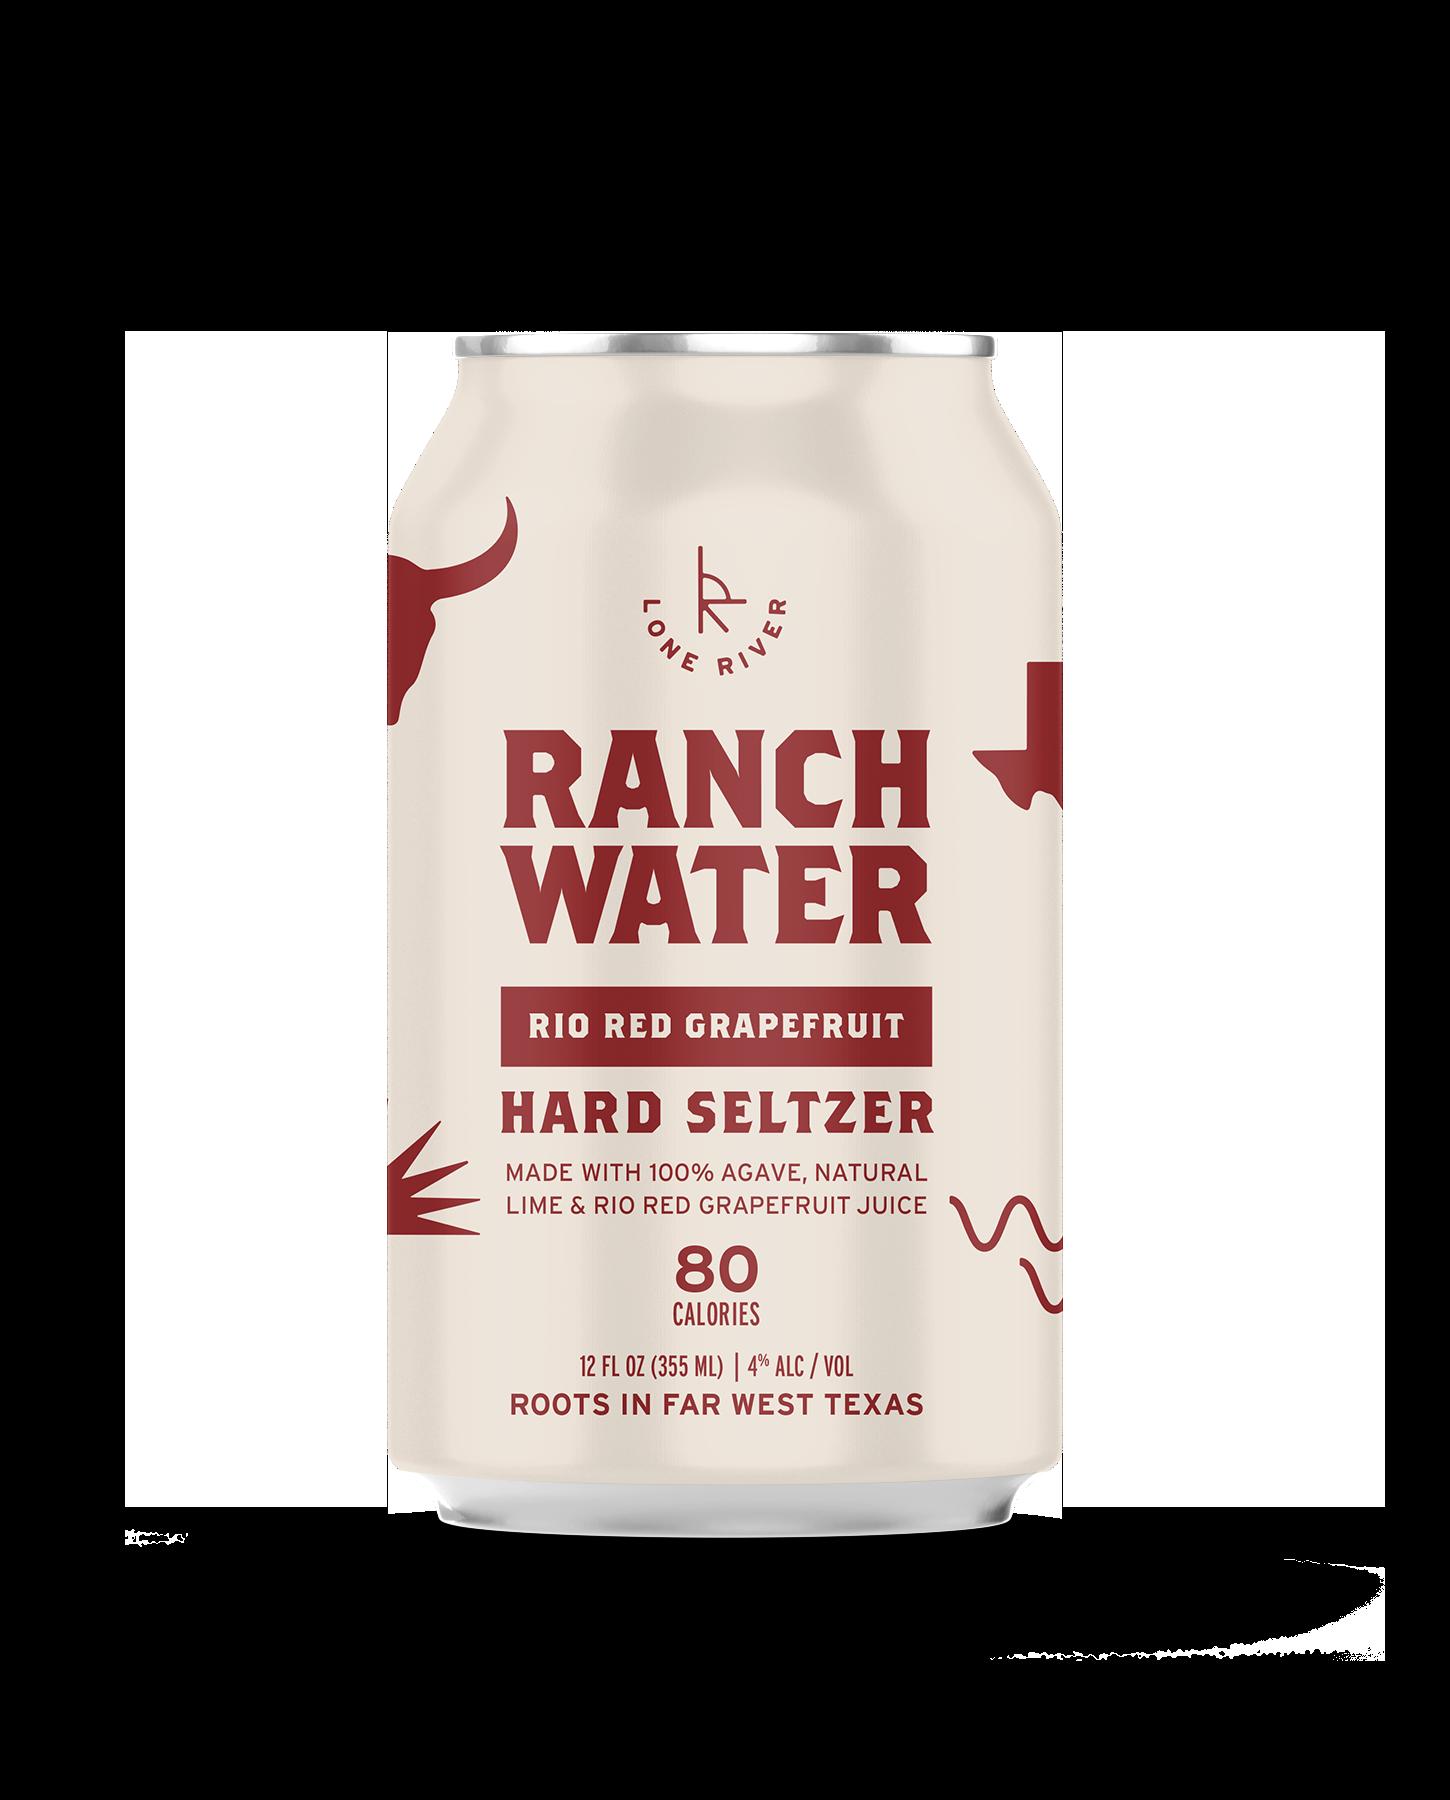 Rio Red Grapefruit Ranch Water Hard Seltzer